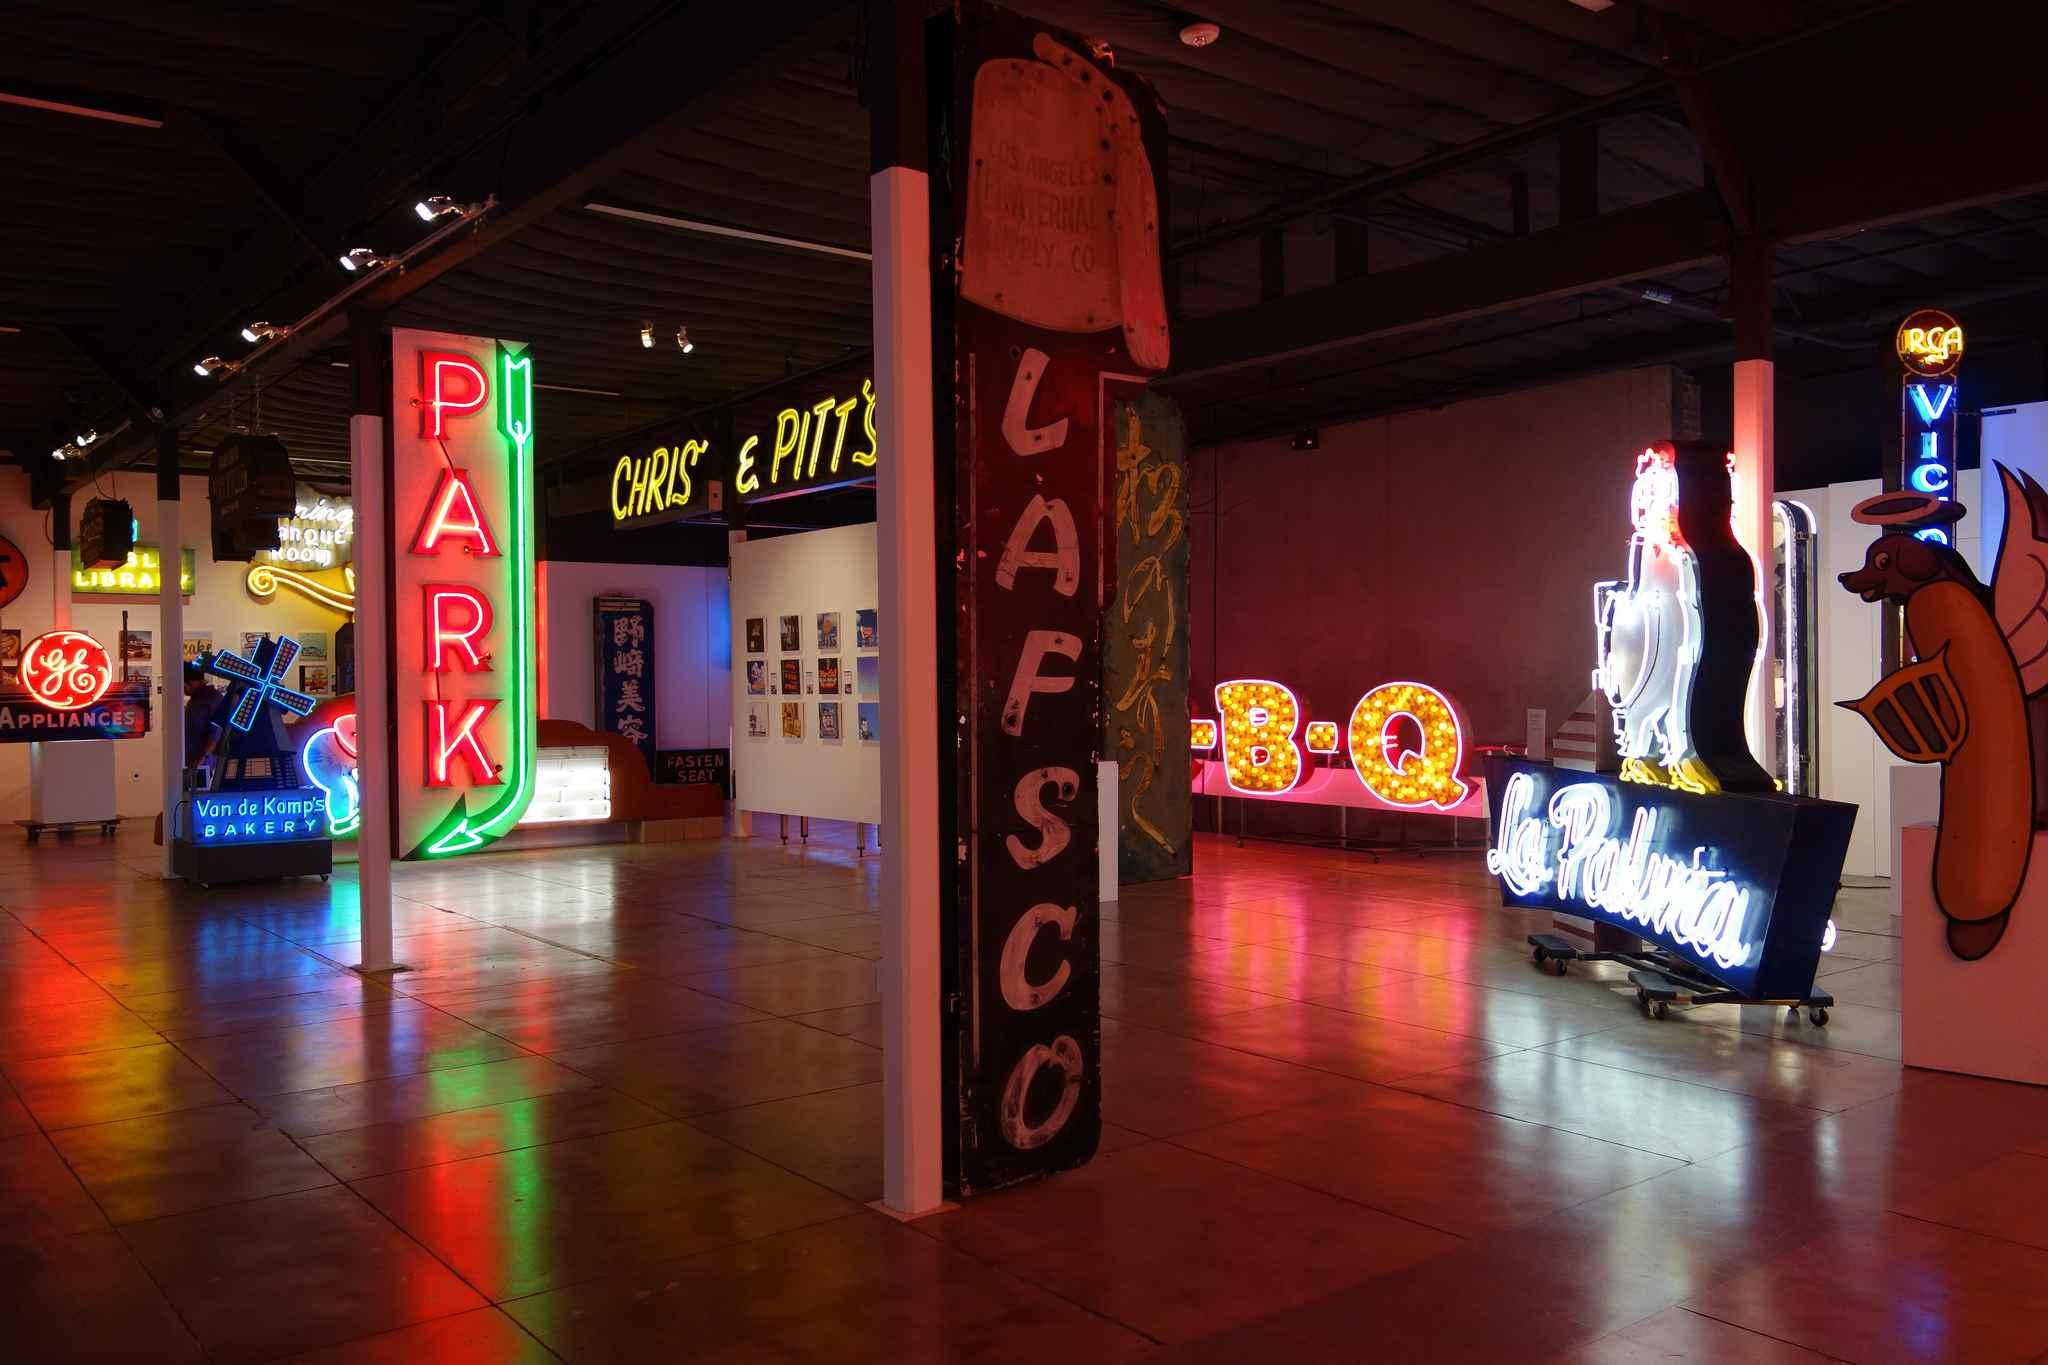 Museum of Neon Art in Glendale